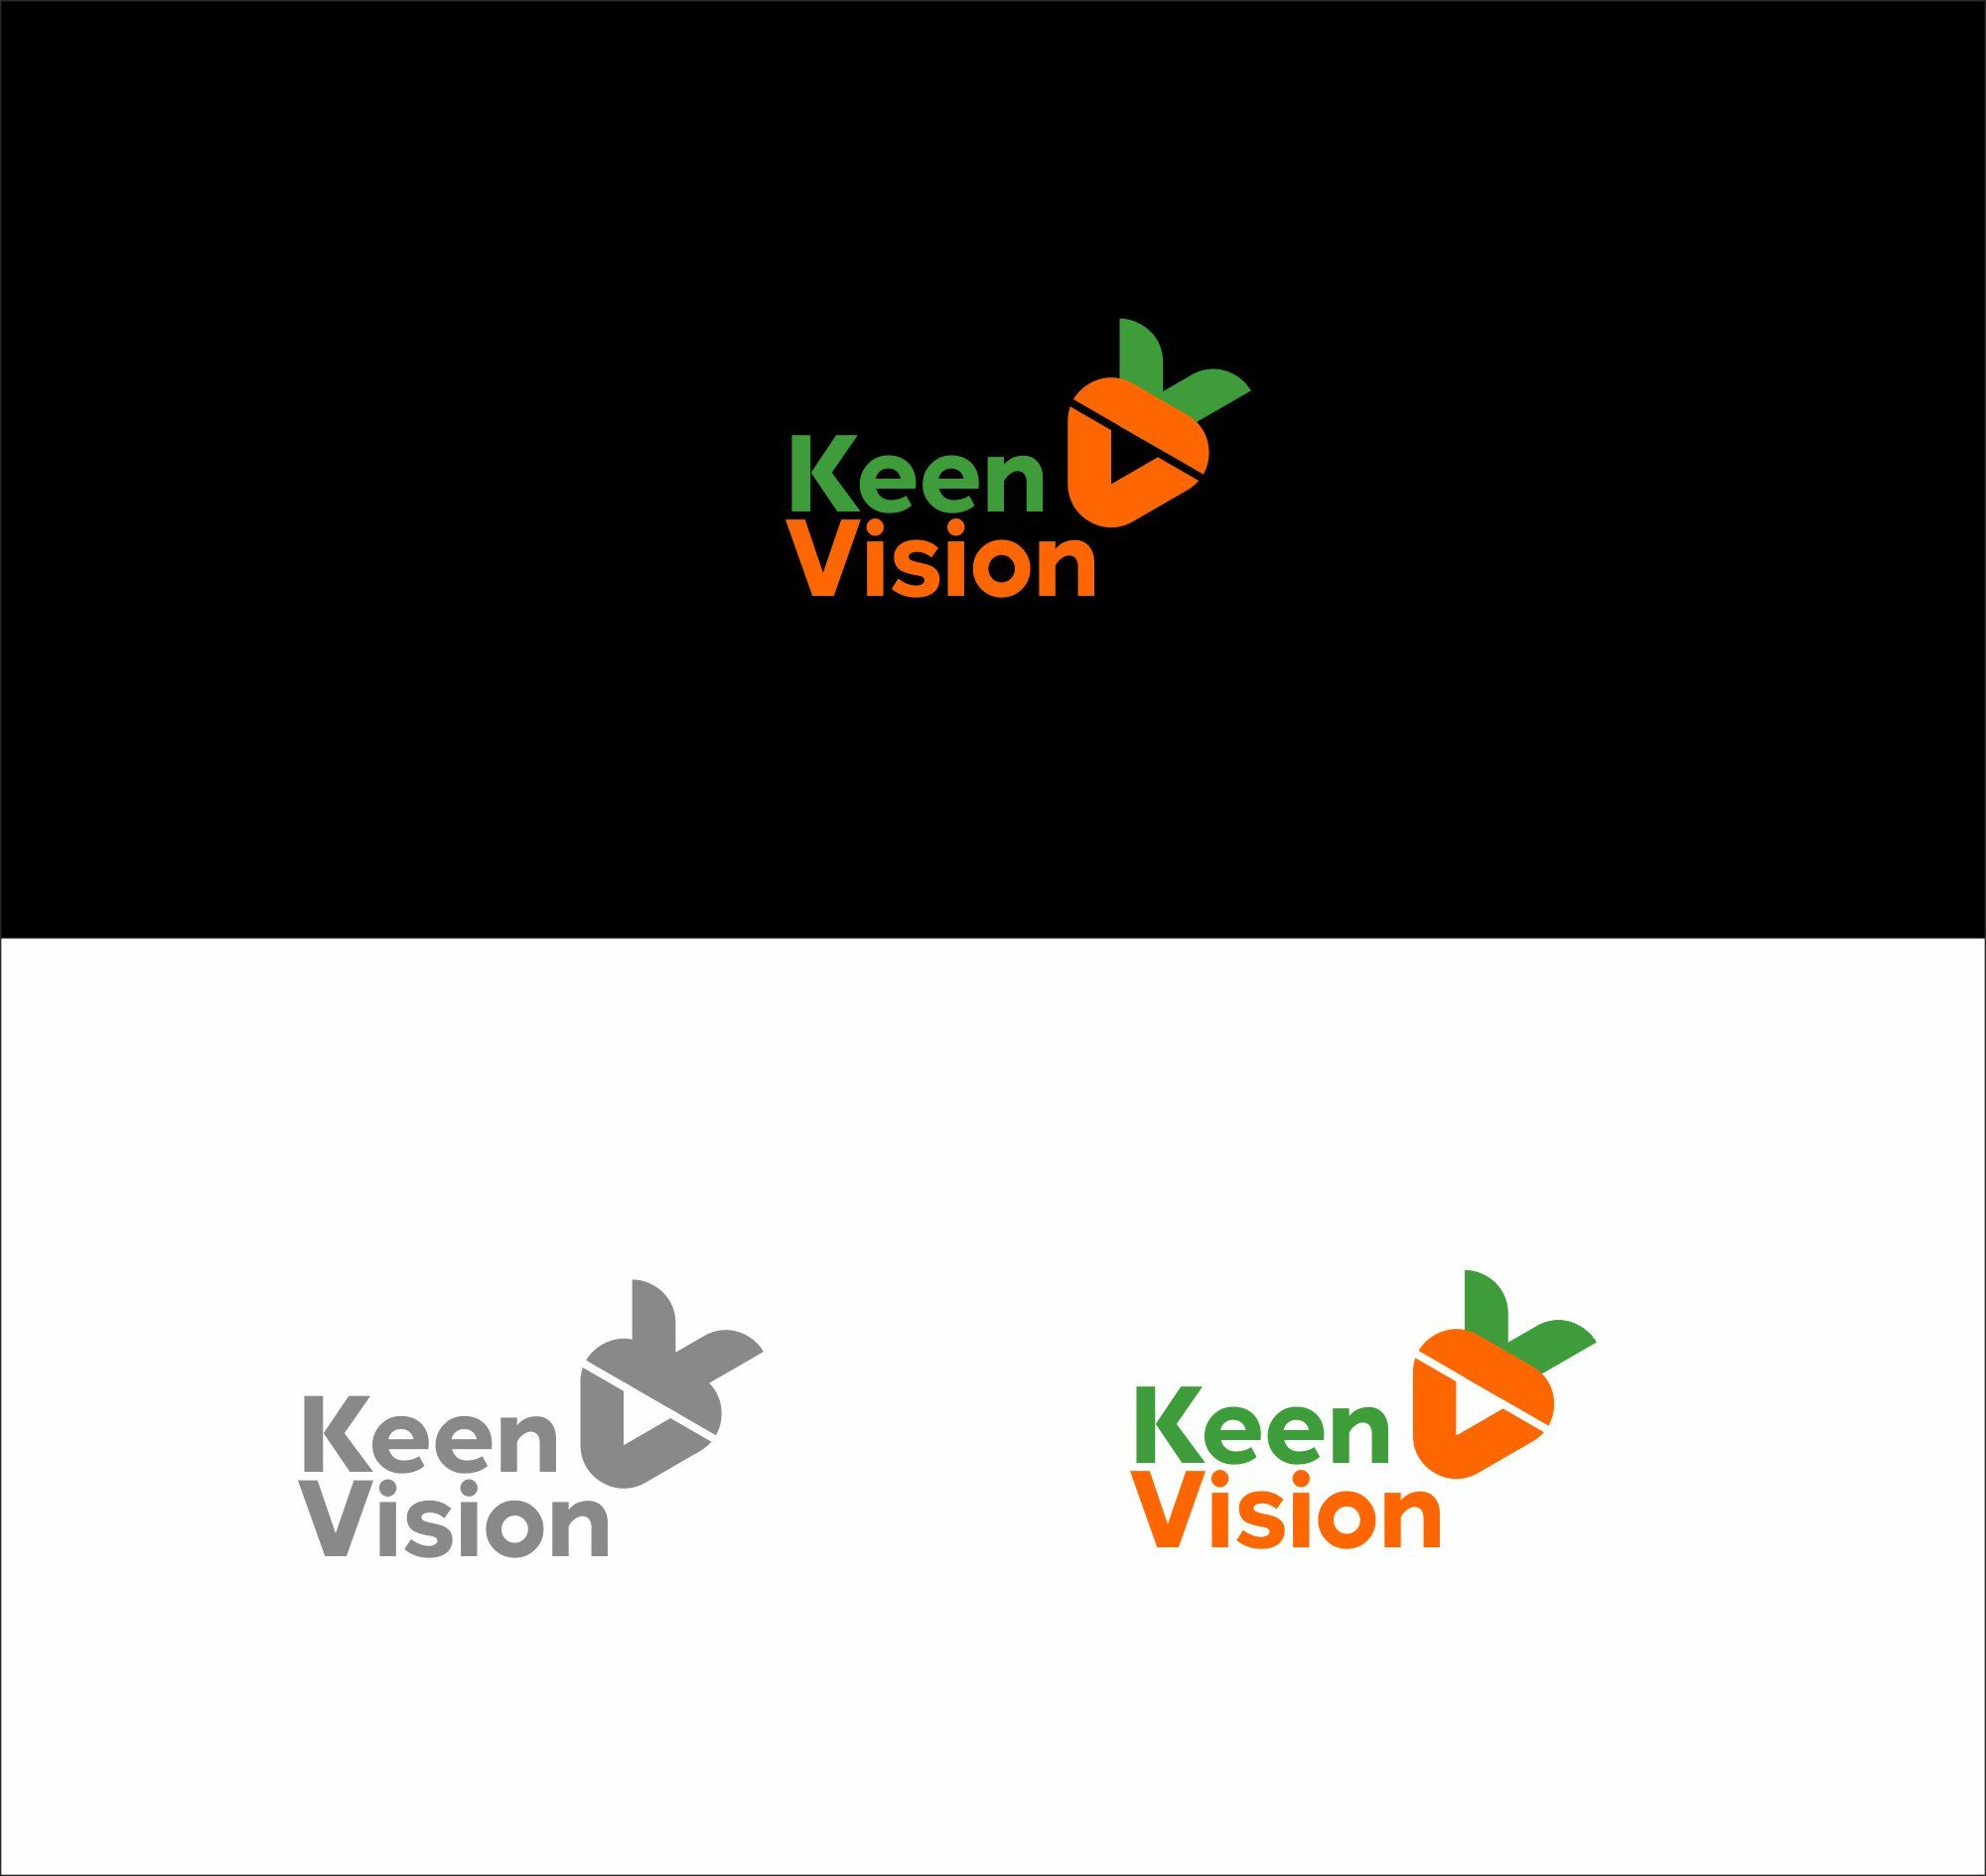 Логотип для KeenVision - дизайнер salik